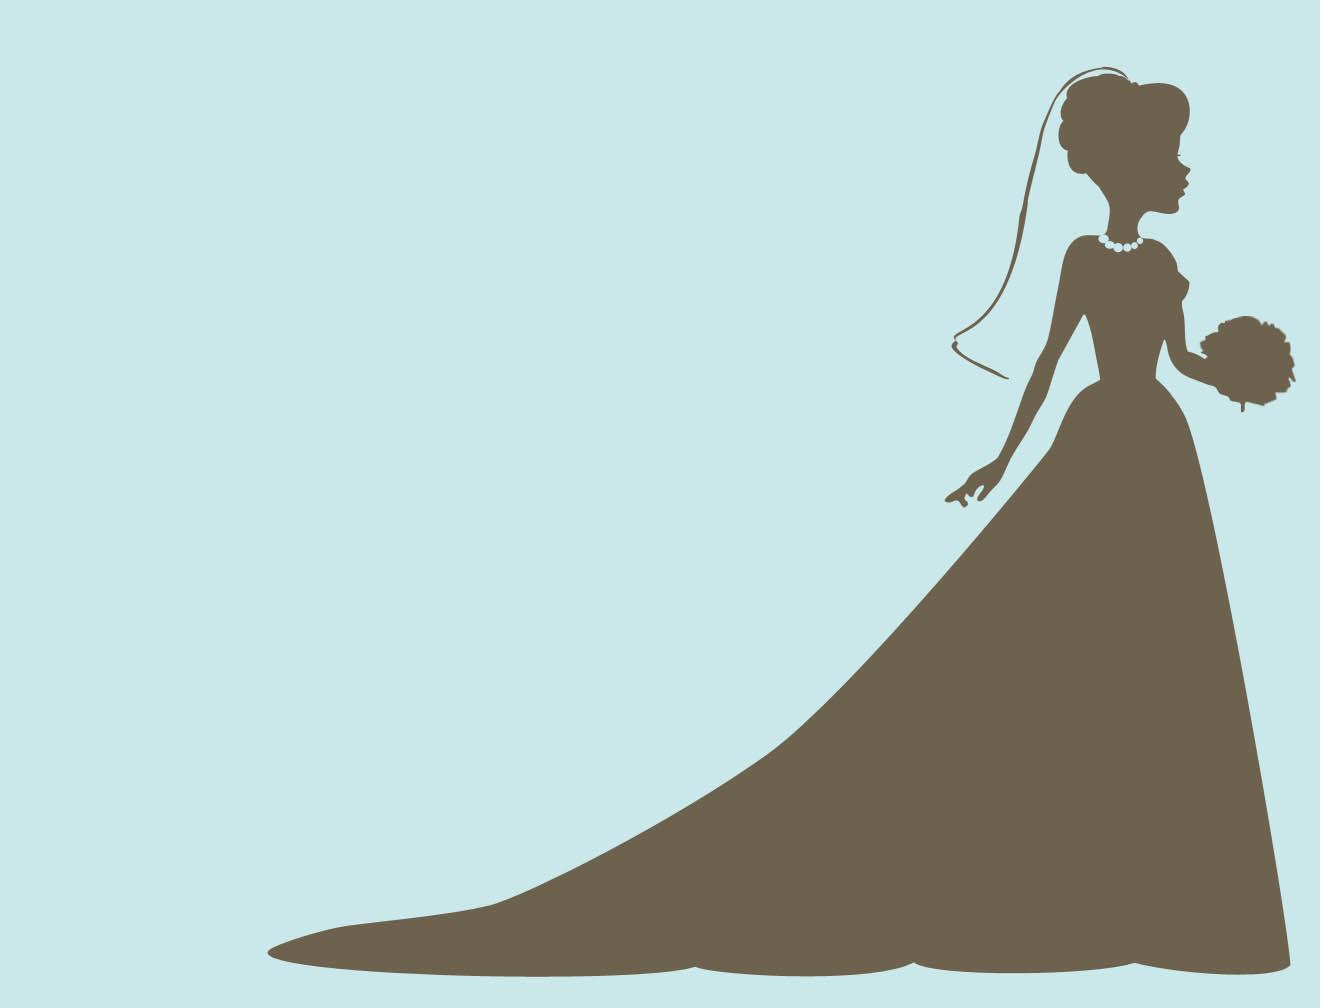 Bridal Shower Clip Art Free Downloads & Bridal Shower Clip Art.